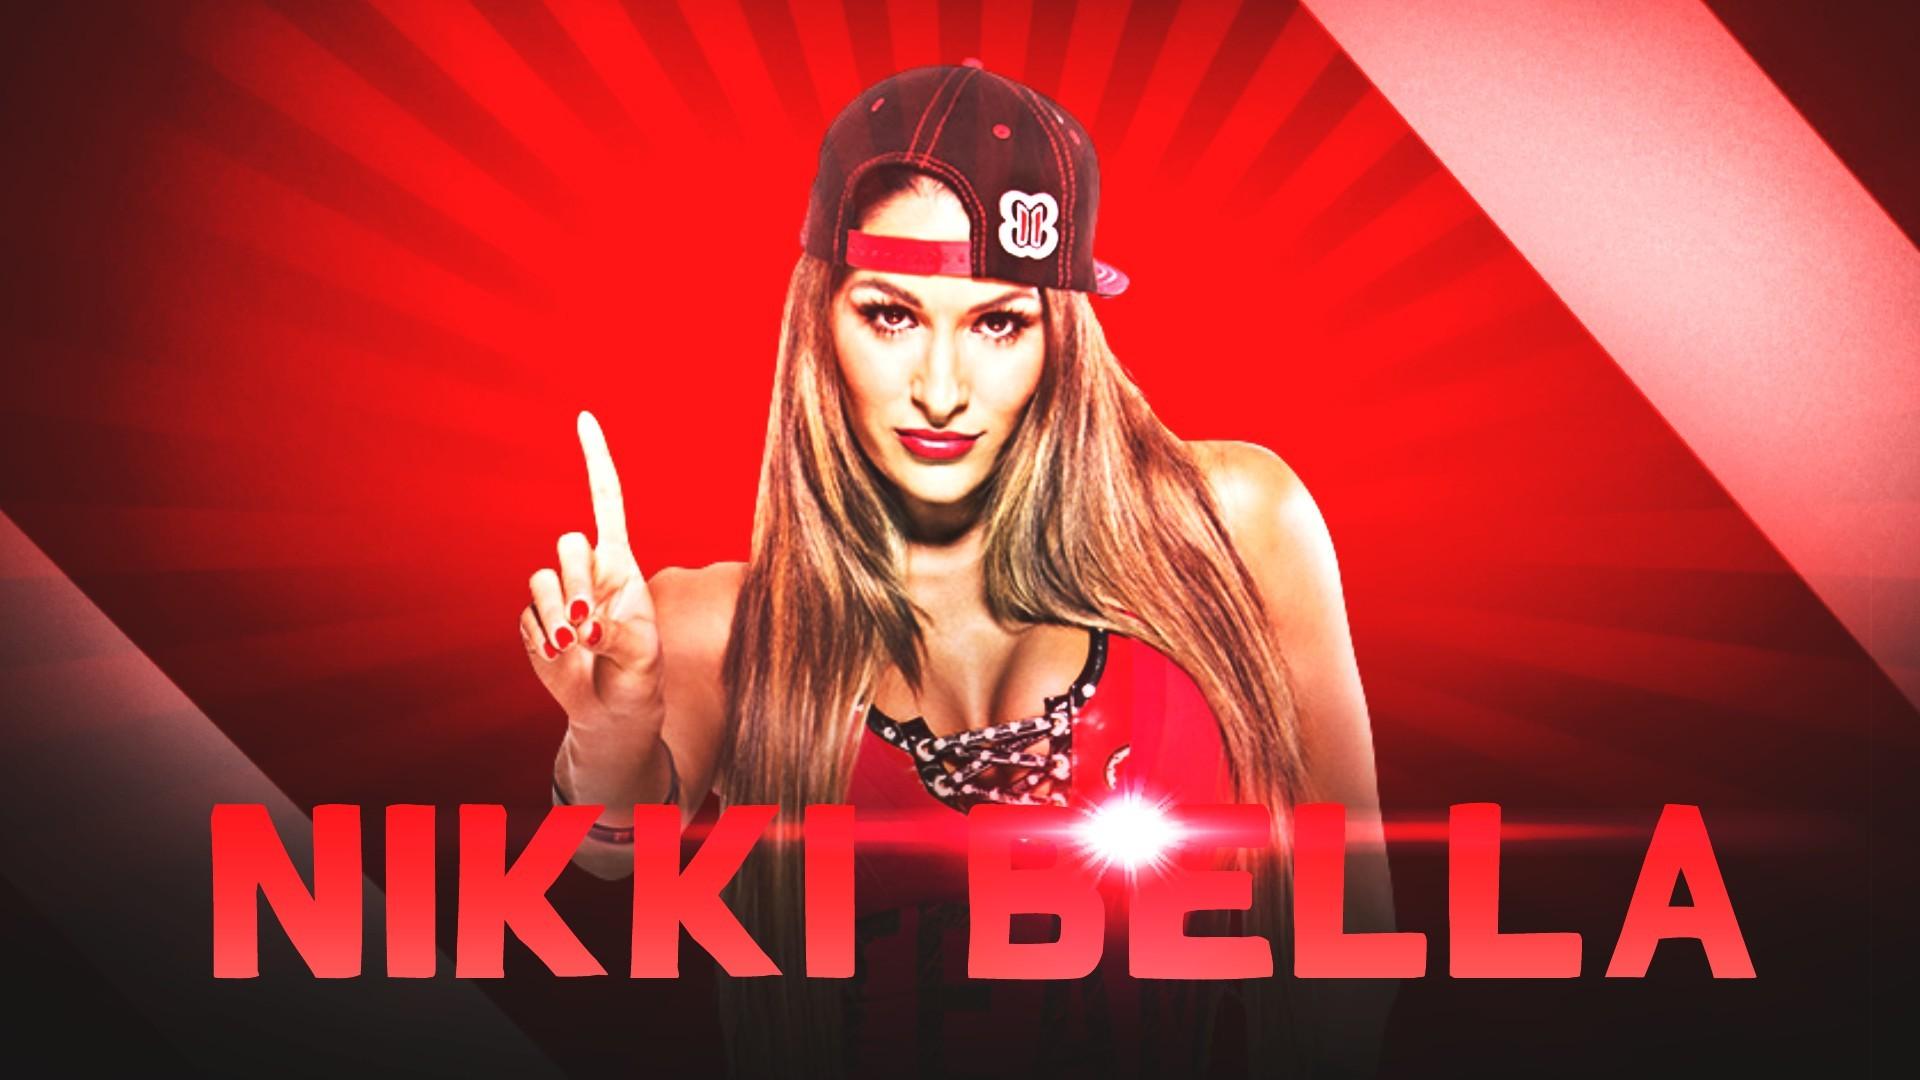 2015 Nikki Bella HD Wallpaper